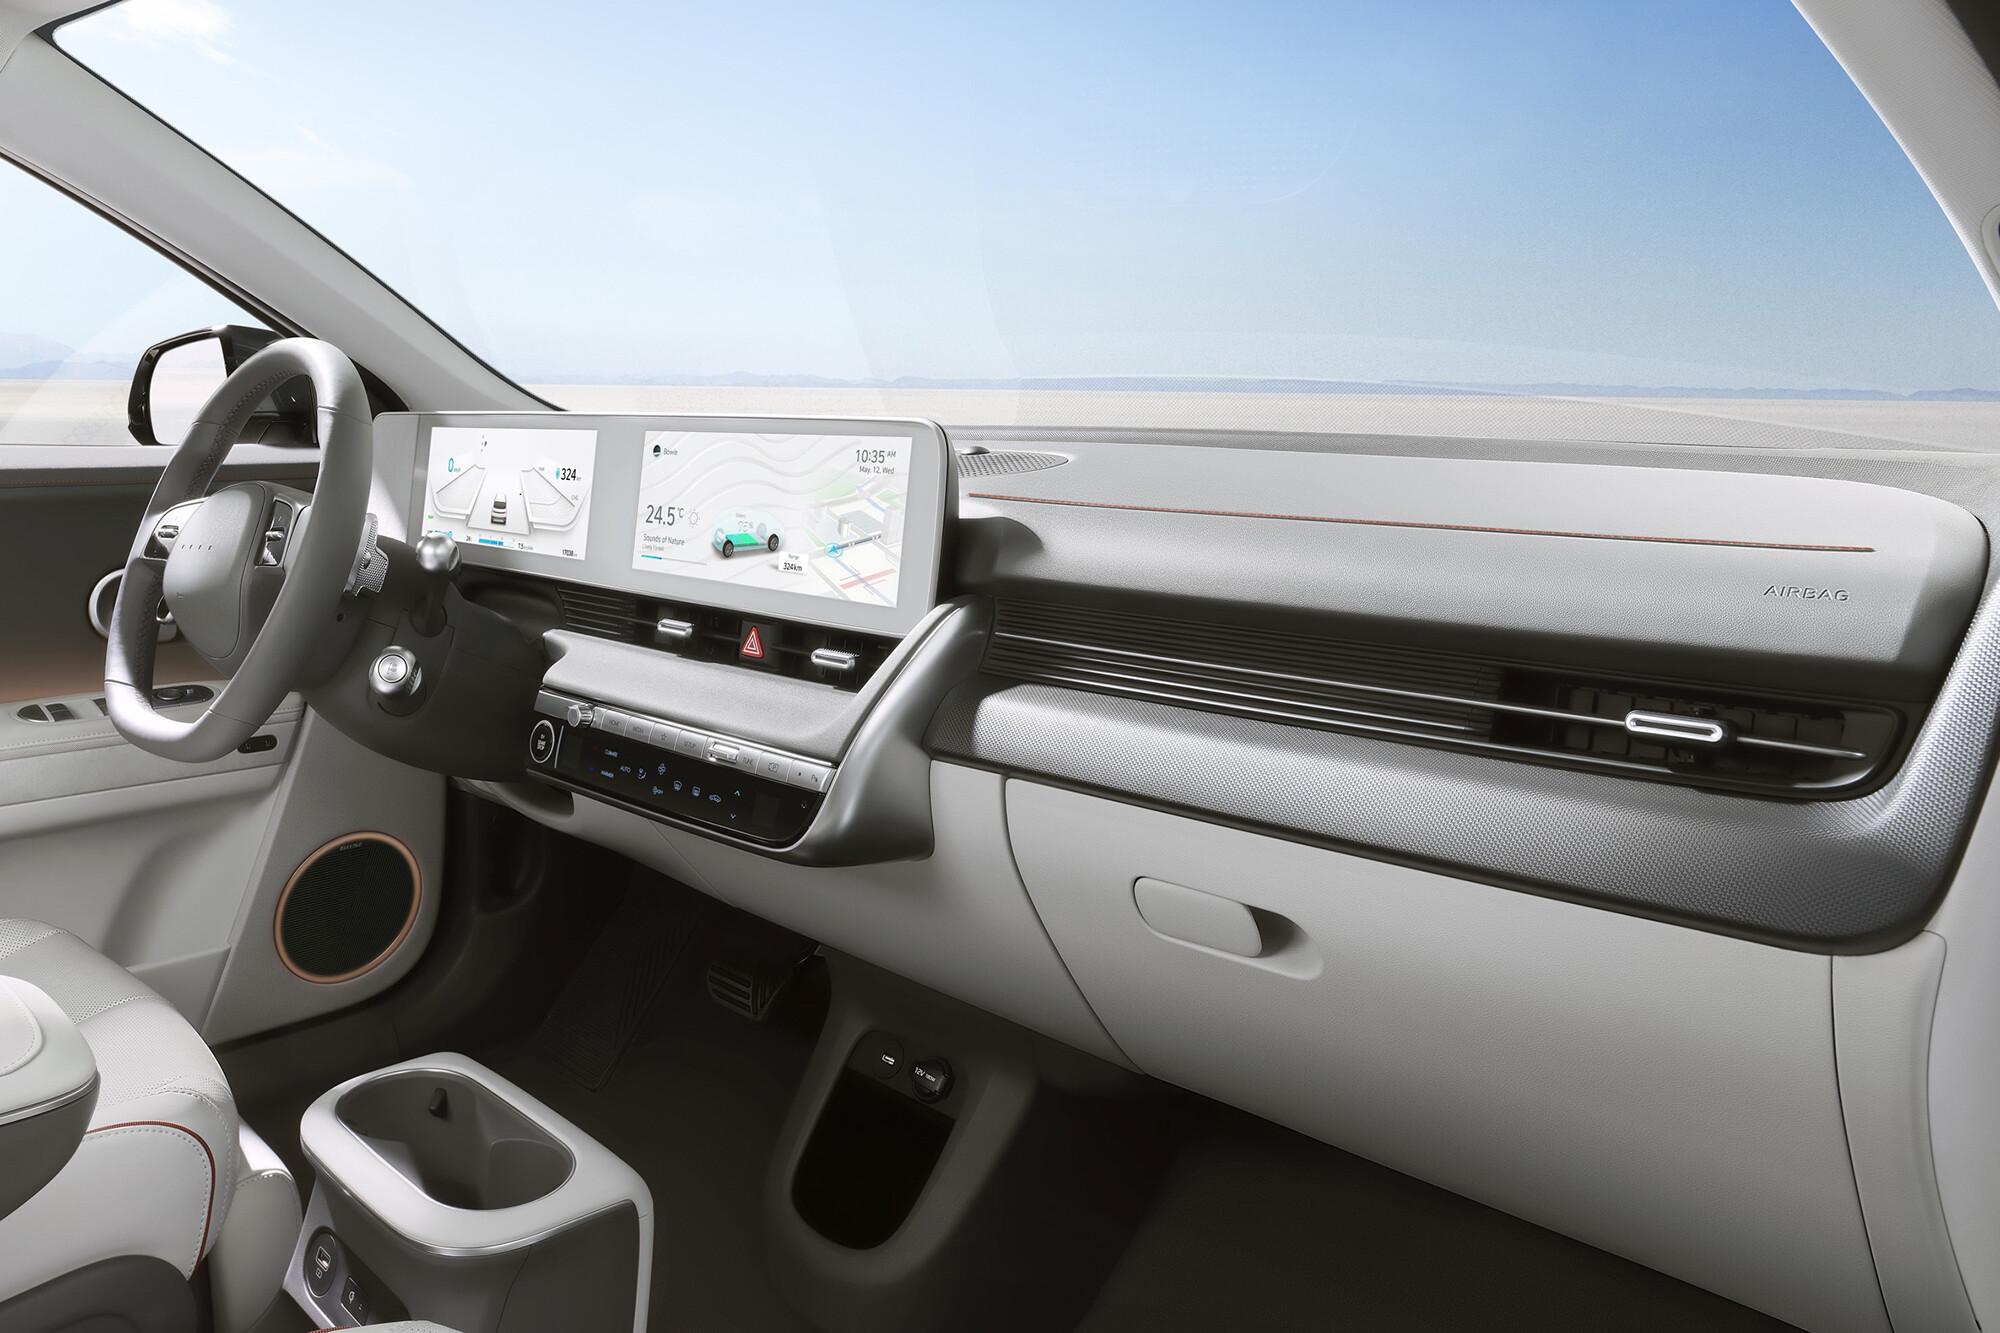 2022 Hyundai Ioniq 5 Electric Vehicle Revealed 5 Jpg